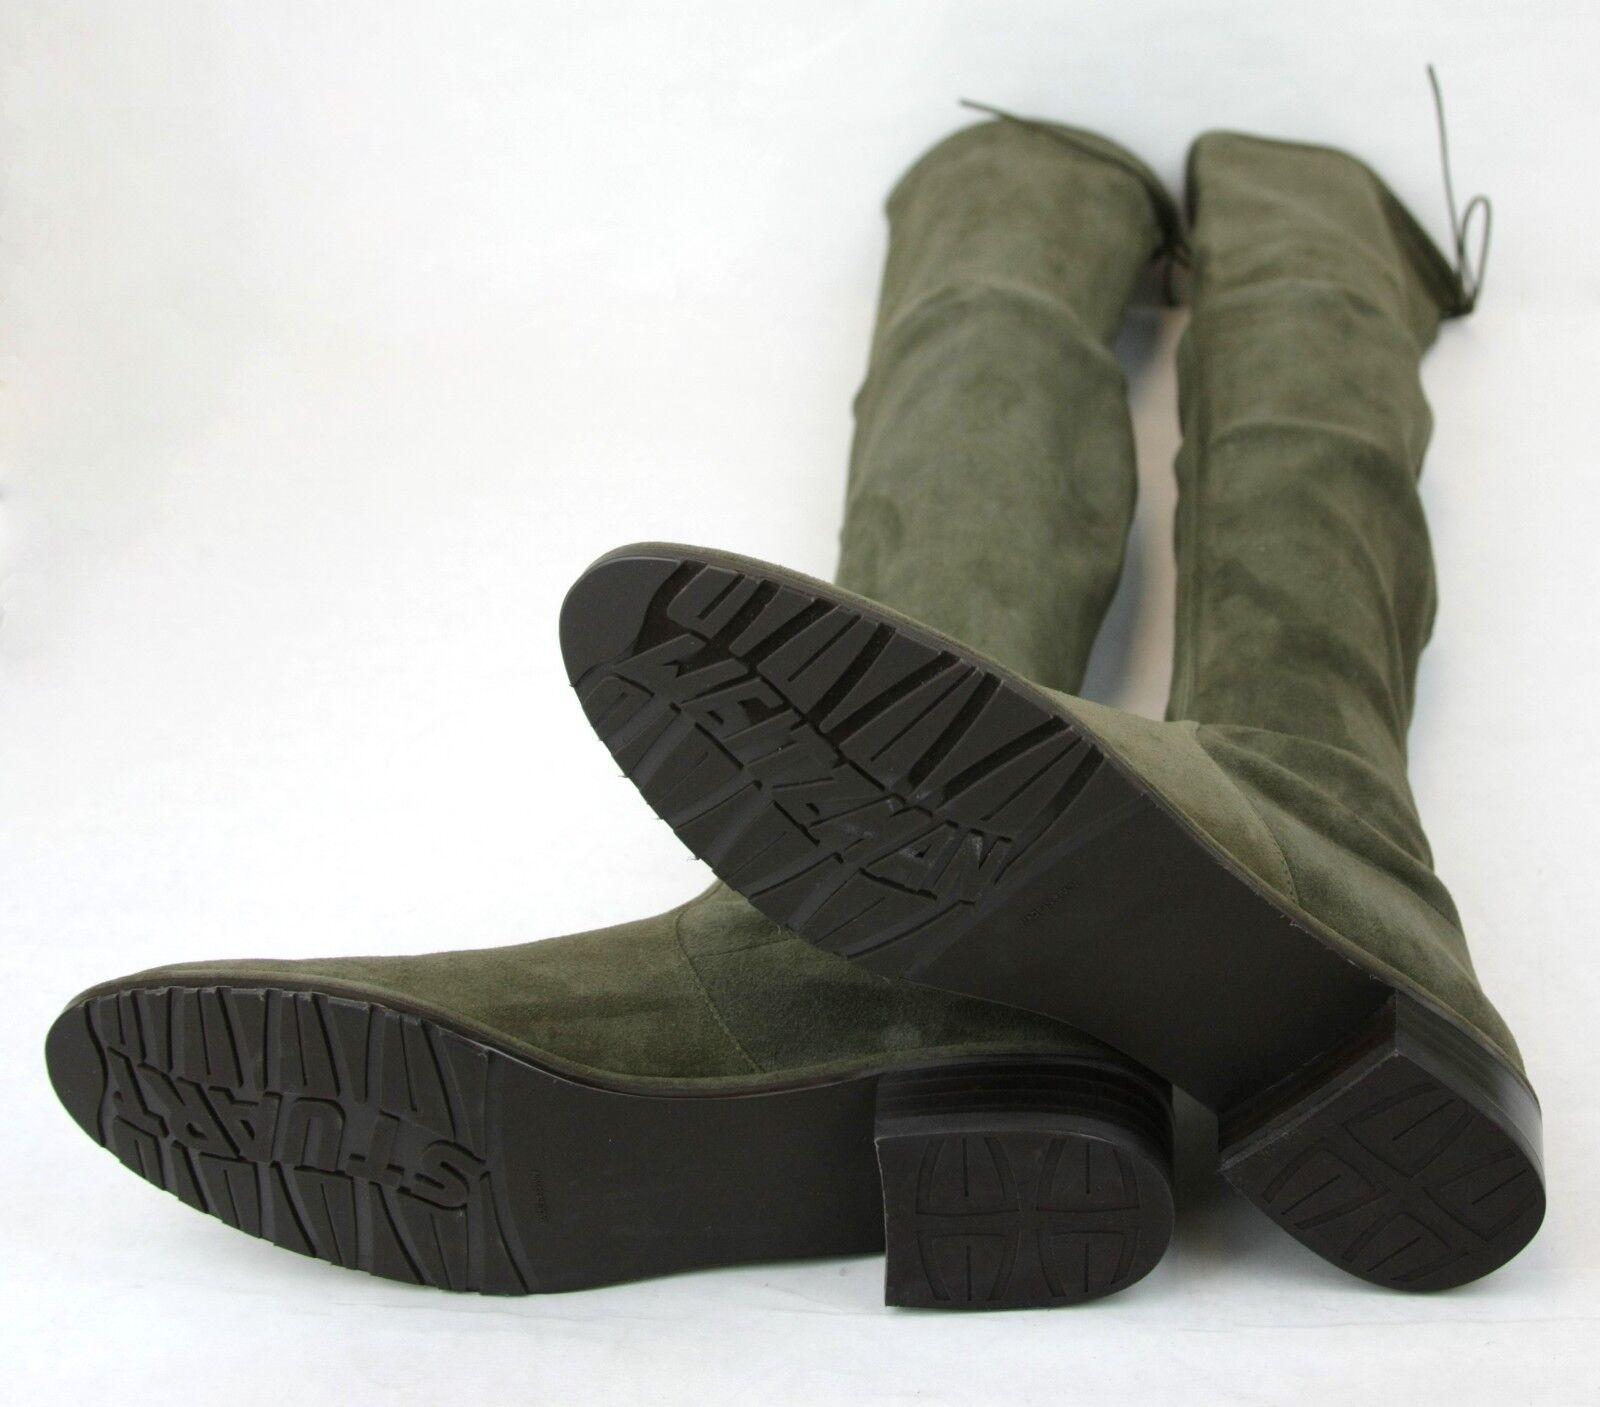 Neu Stuart Weitzman Lowland Loden Grün Veloursleder Overknee Stiefel Stiefel Stiefel 64fa7f